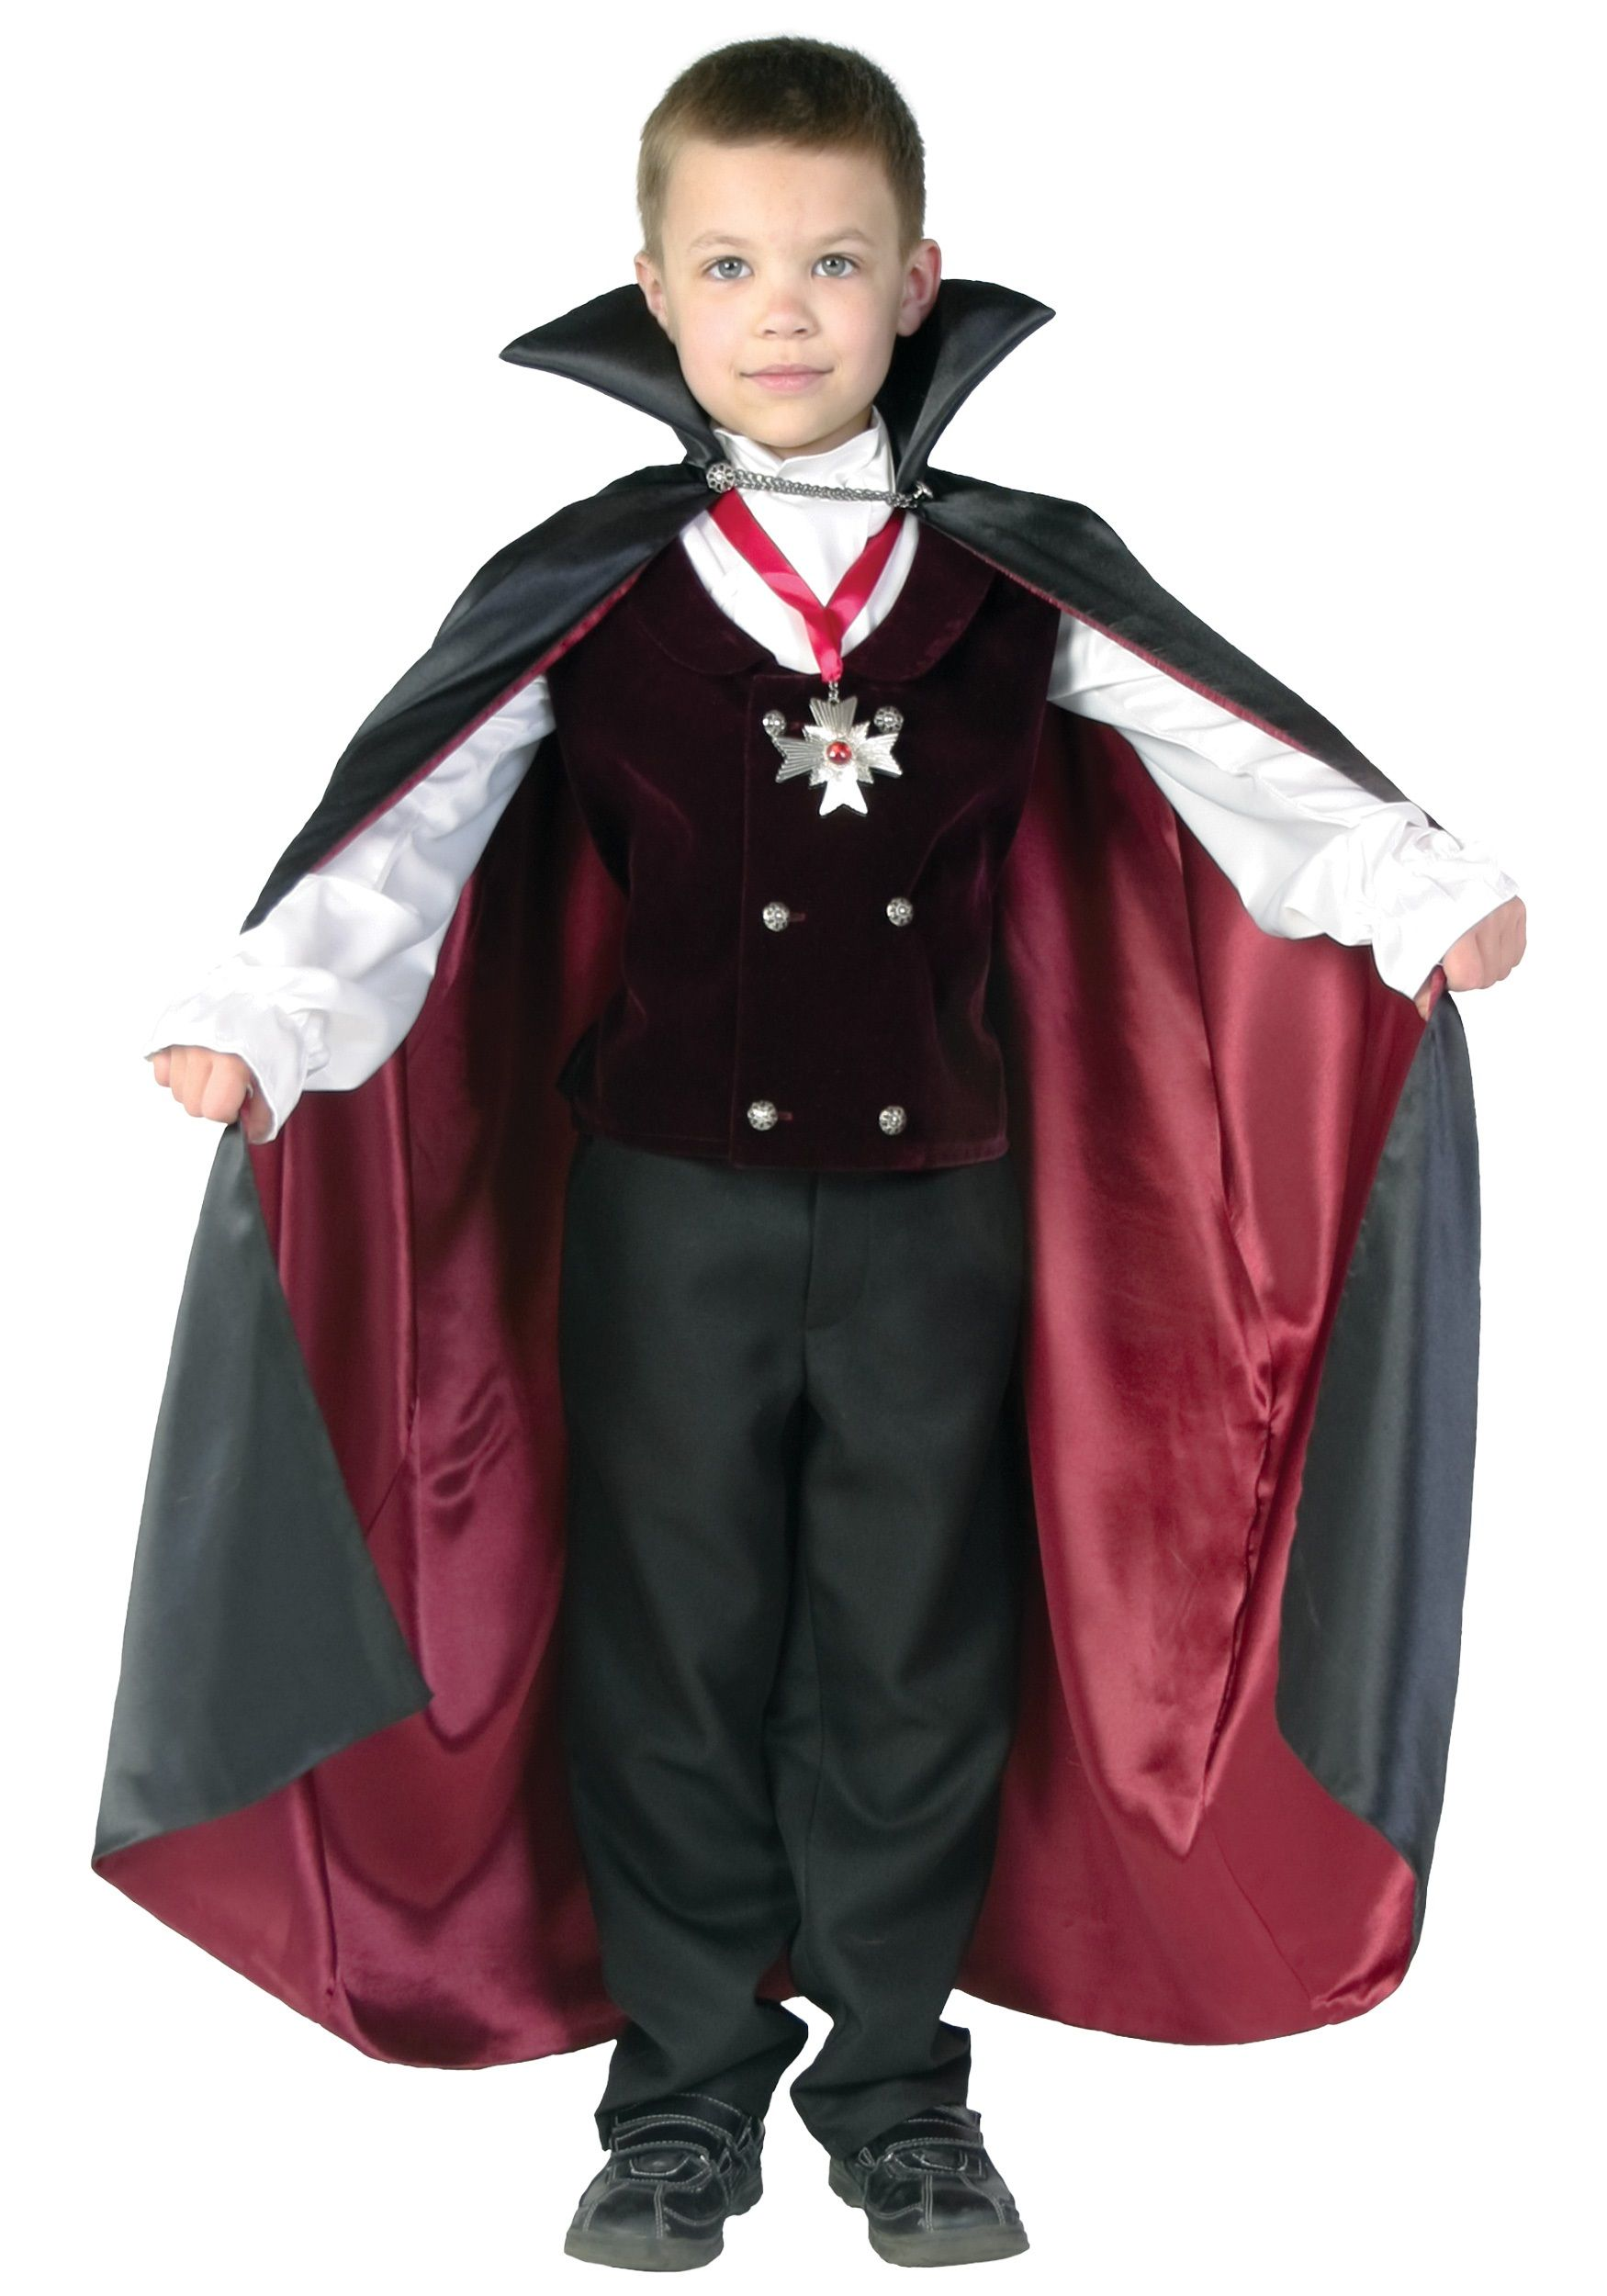 Easy DIY Vampire Costume Vampire costume diy, Vampire